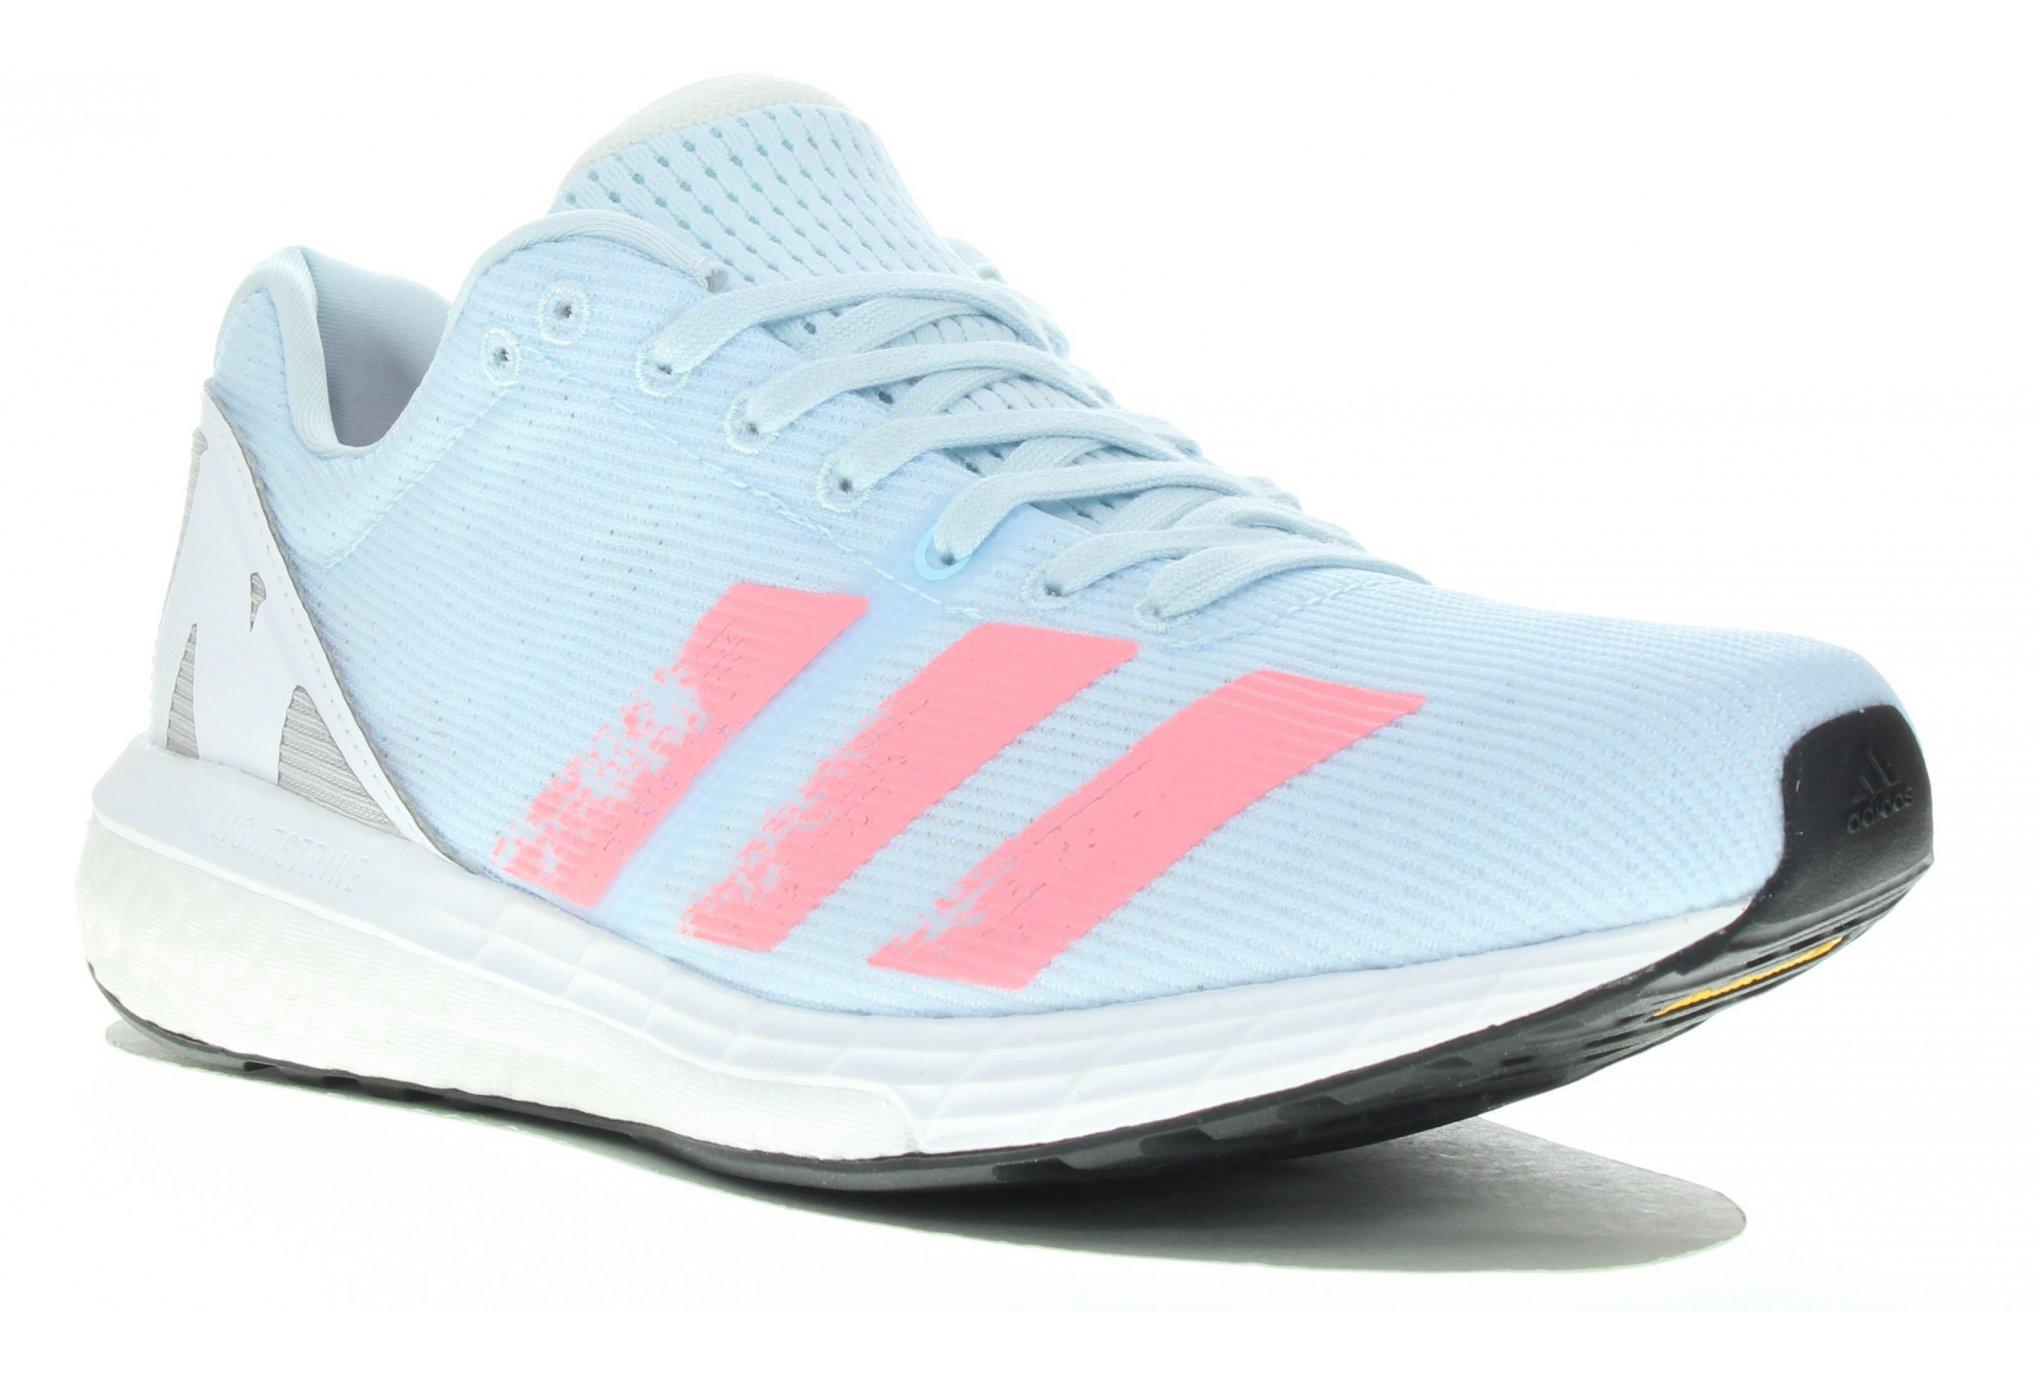 adidas adizero Boston 8 Chaussures running femme